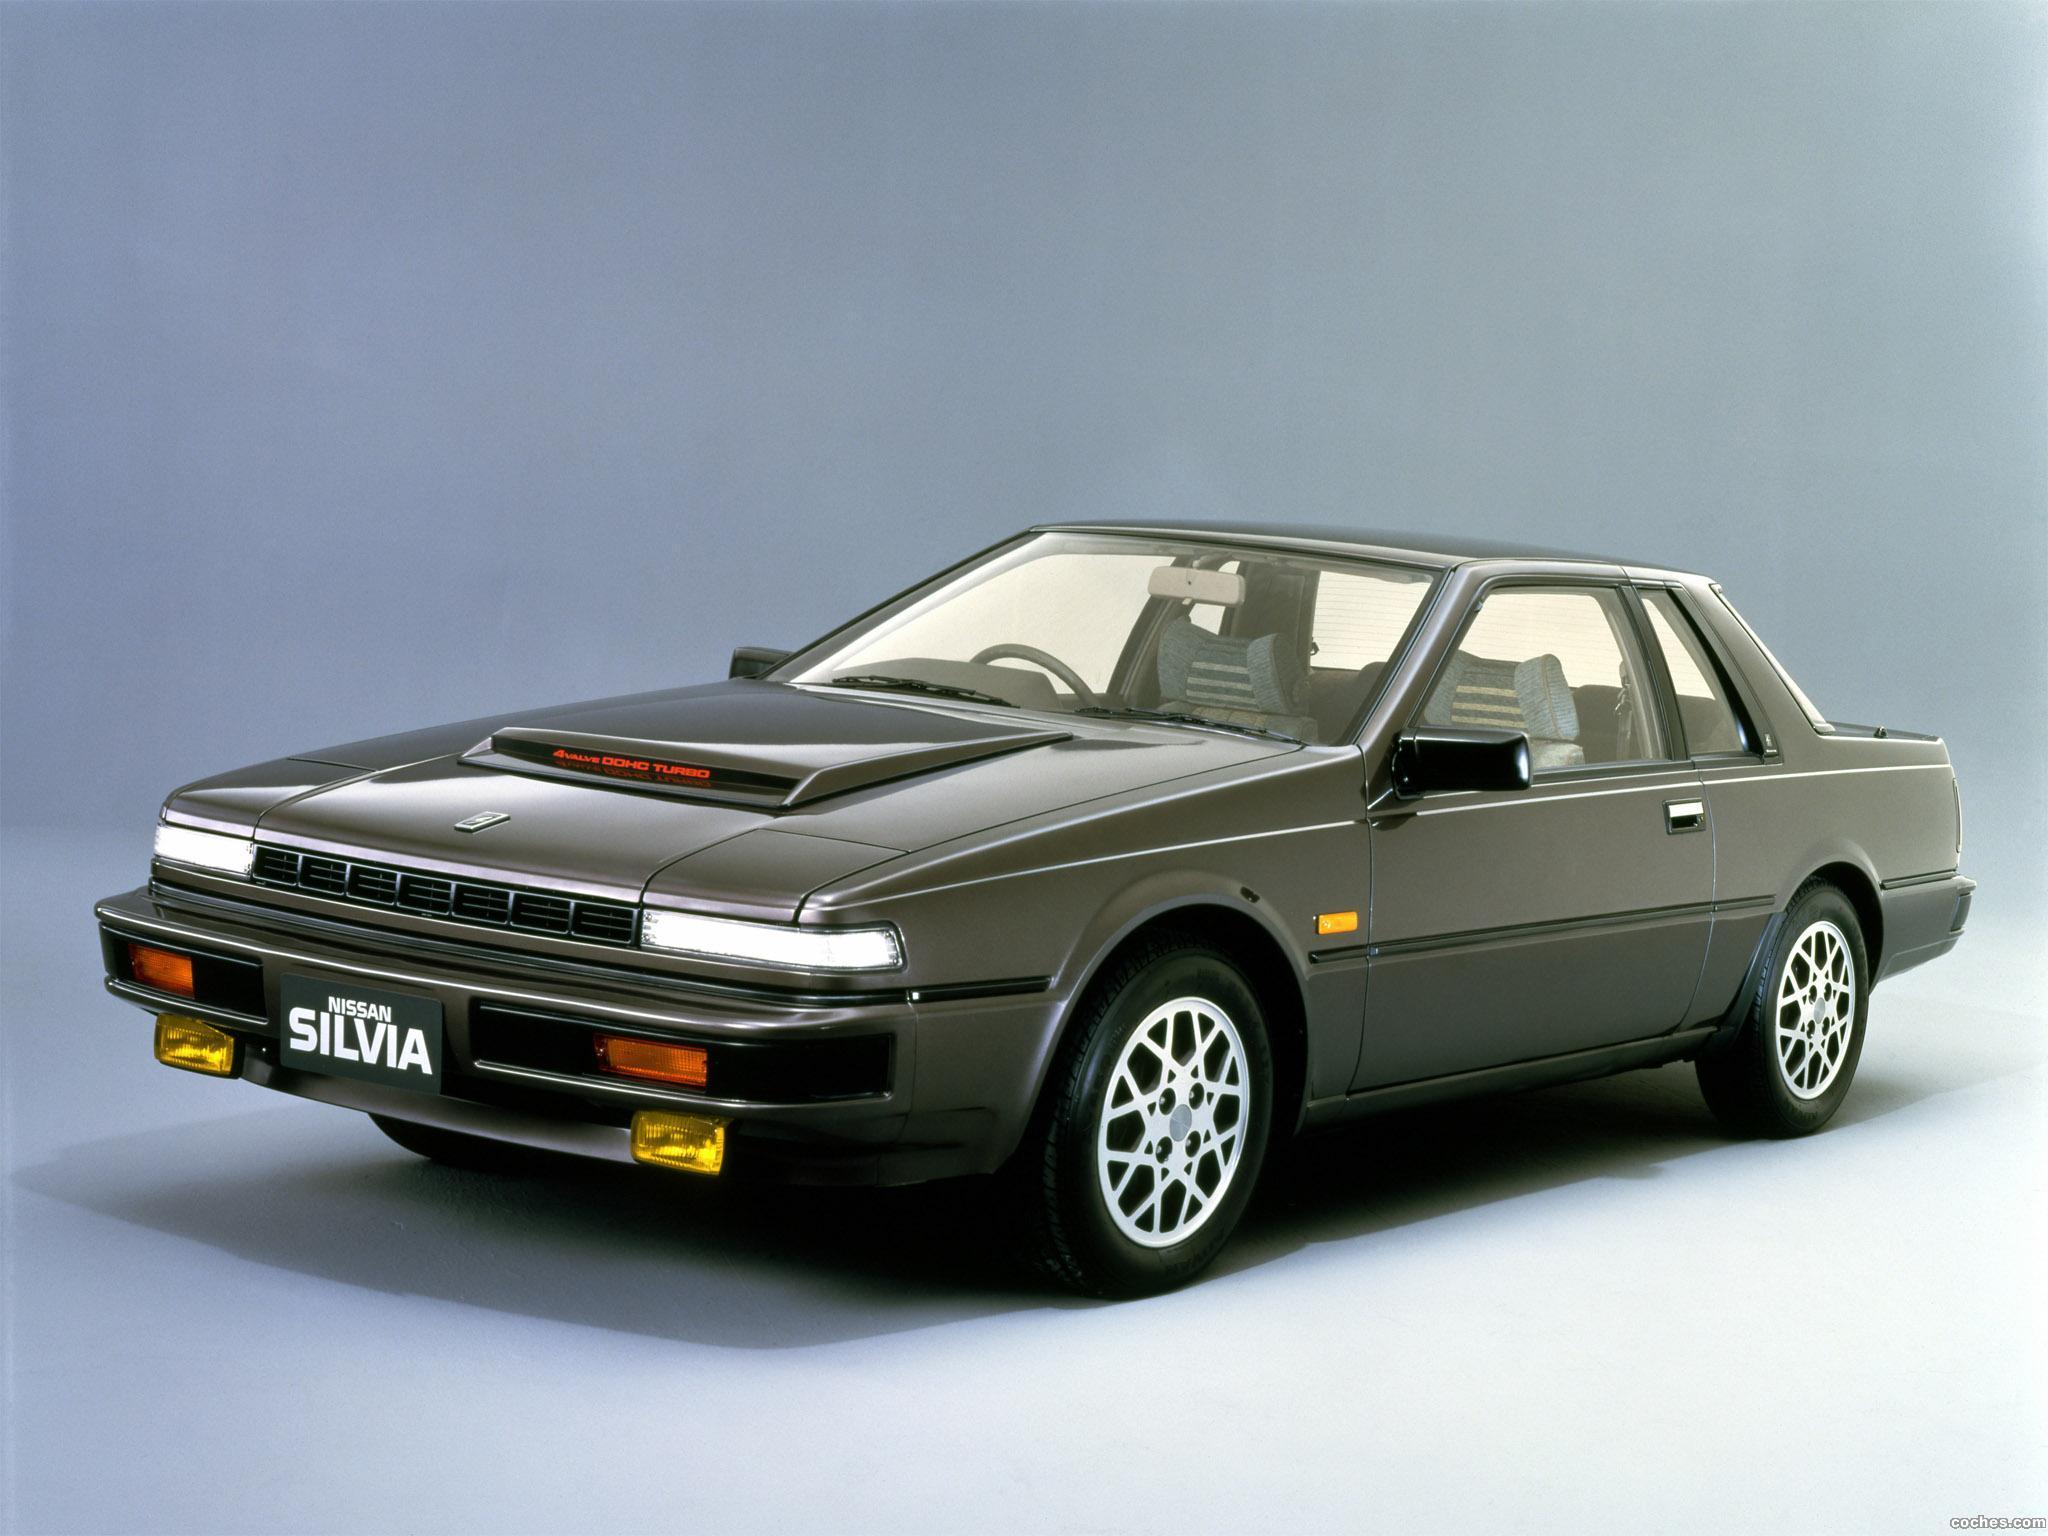 Foto 0 de Nissan Silvia Coupe S12 1983